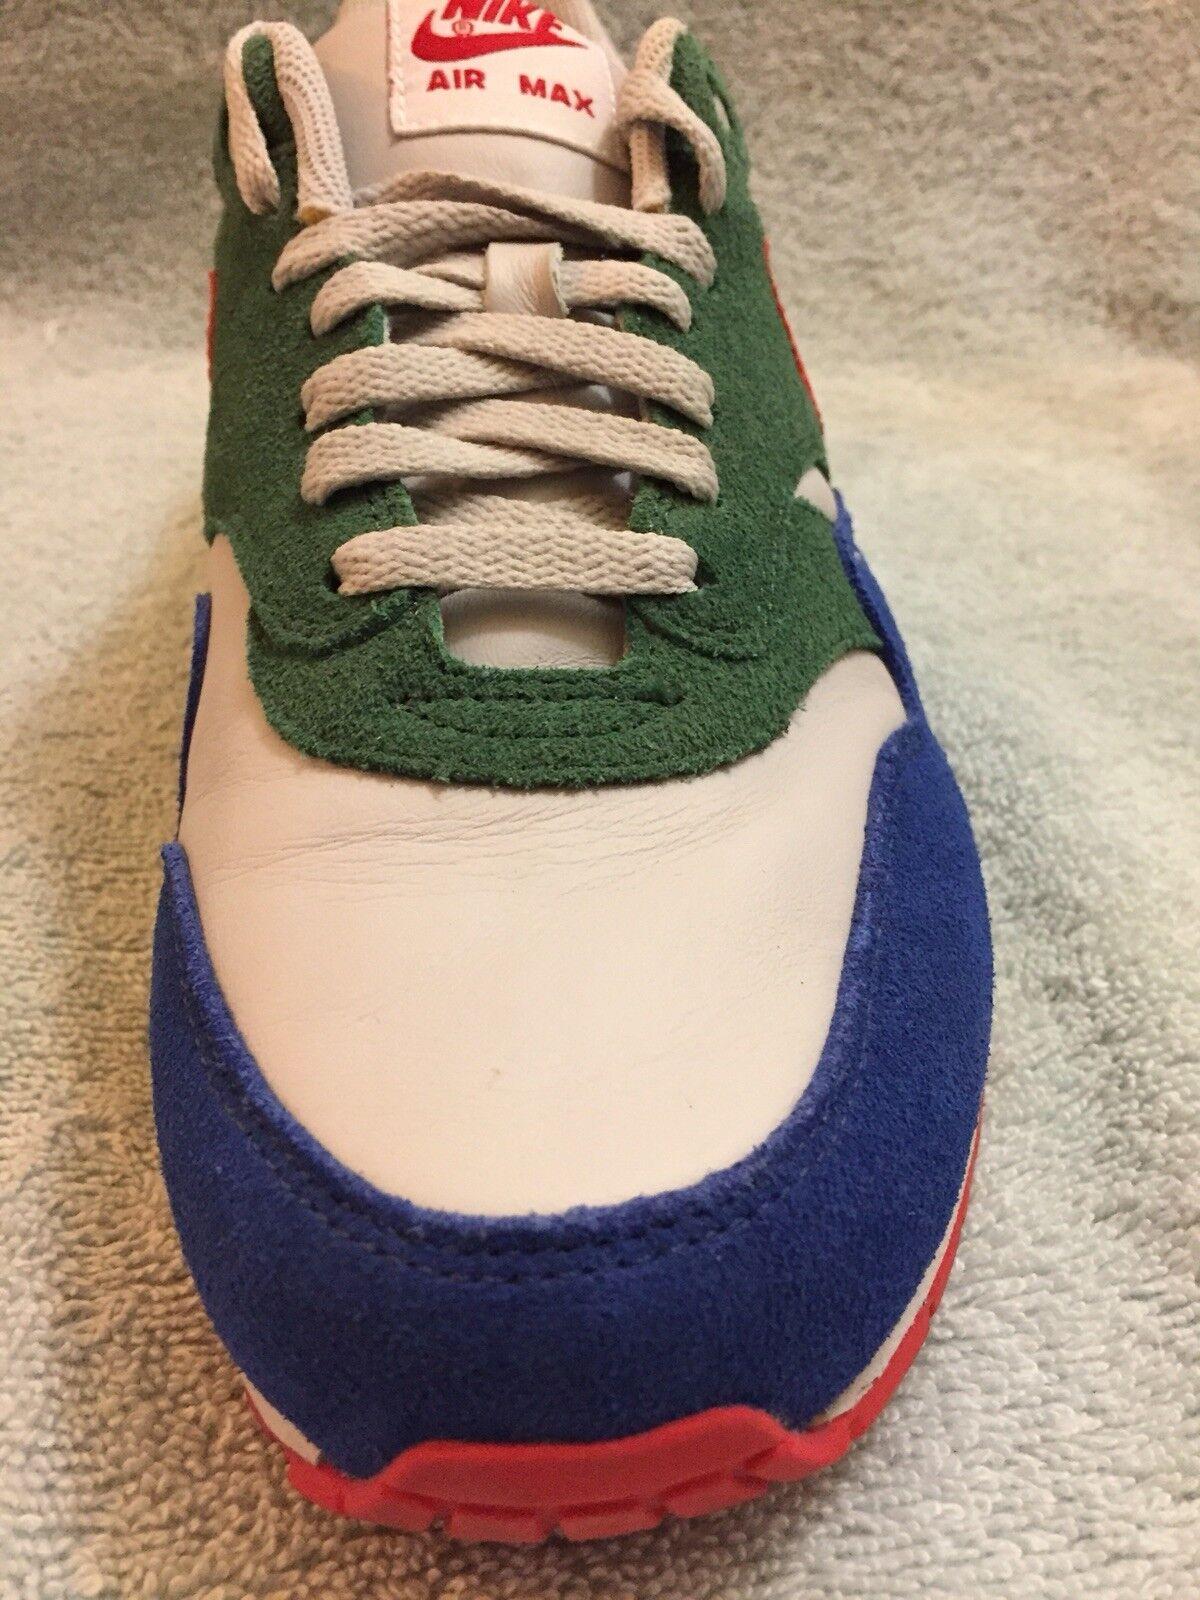 les 433213-998 nikeid air 4life max cpc 4life air rouge vert bleu - gris taille 10 suède yello 6d09f7